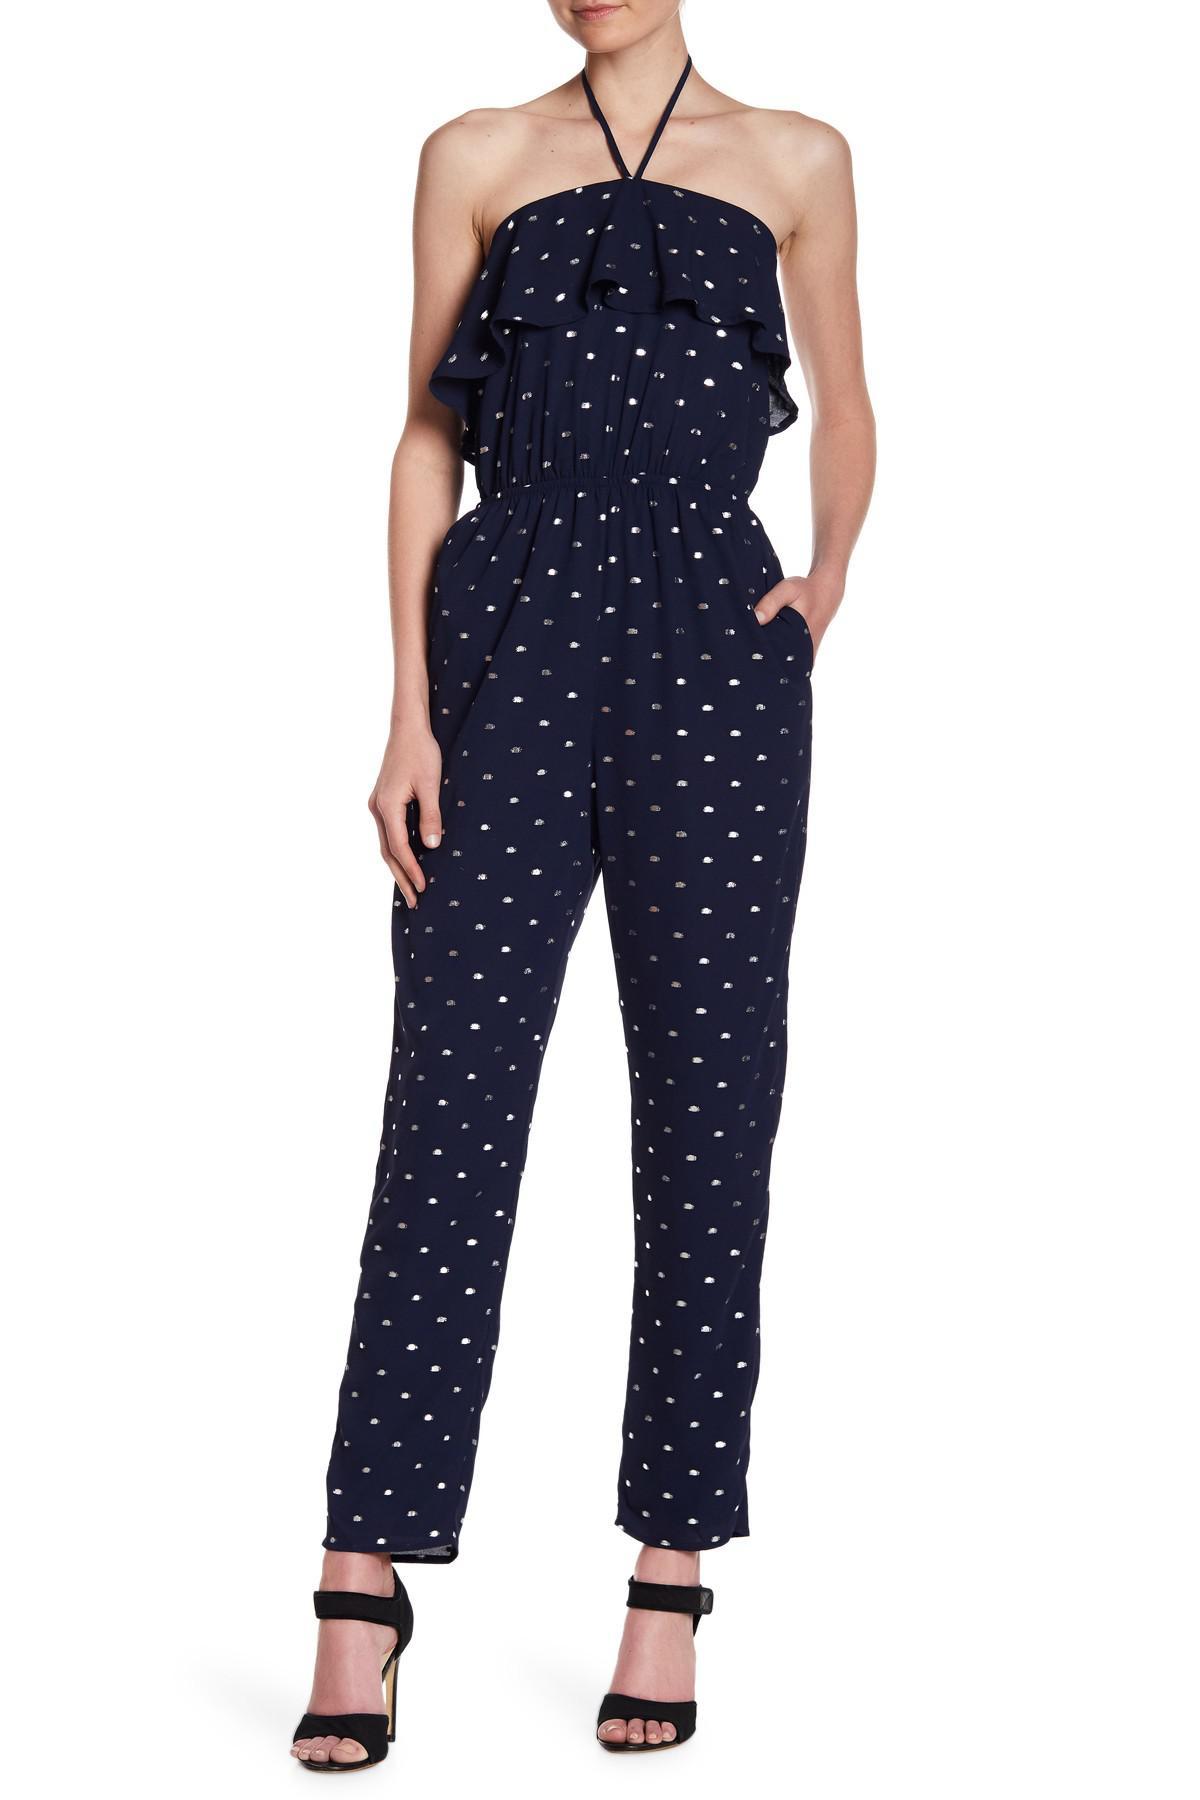 4e45a558919 Lyst - Sugarlips Maxine Ruffle Jumpsuit in Blue